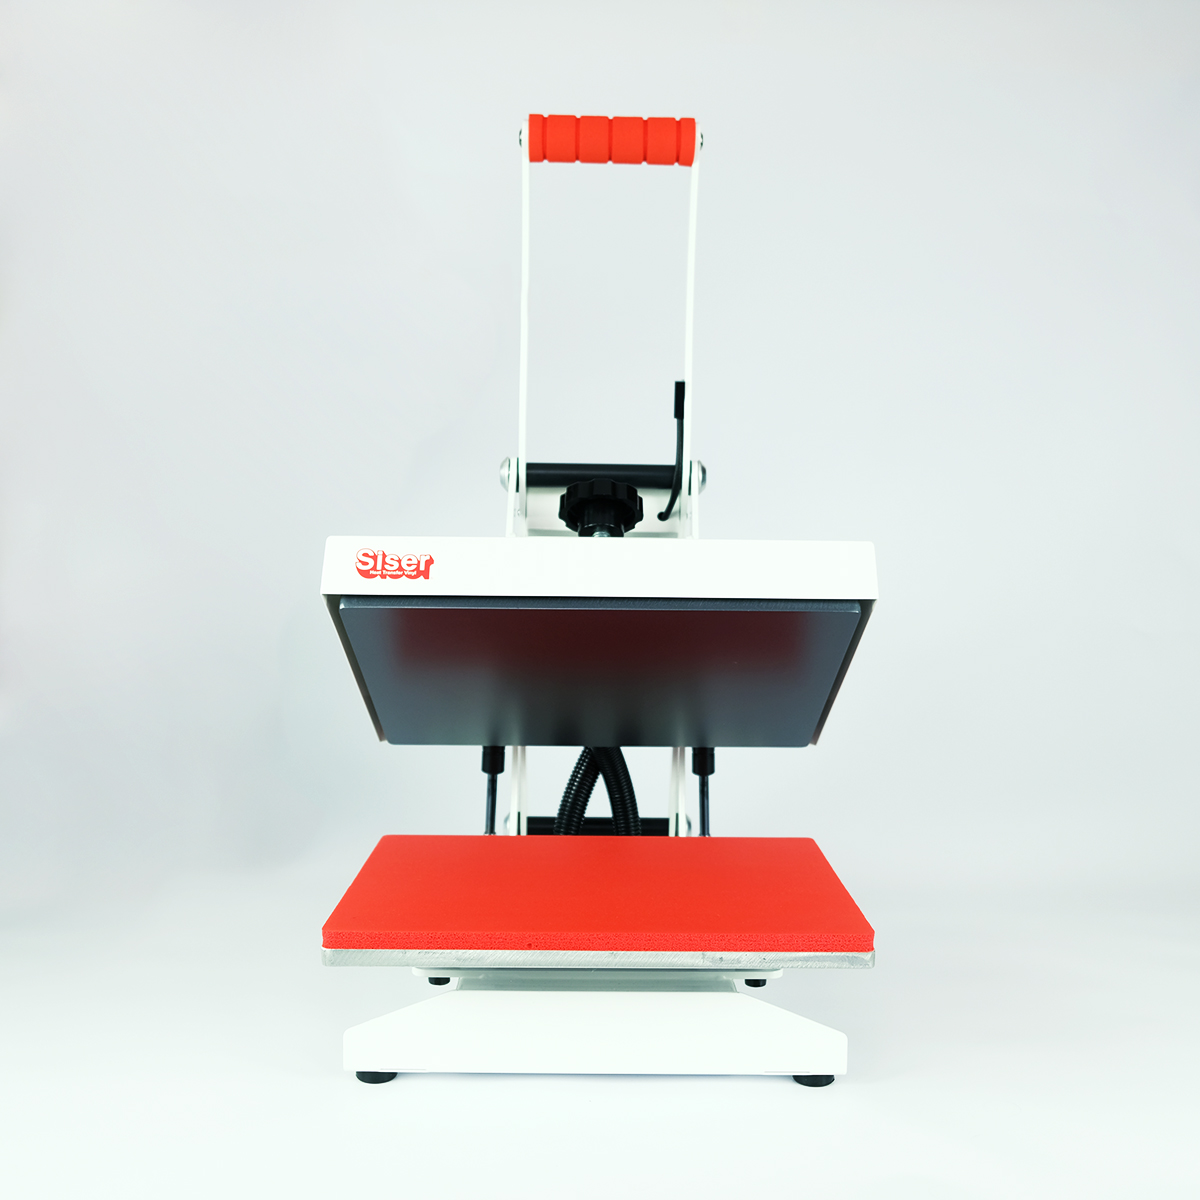 Presa manuala, compacta, Craft Siser - vizibilitate platane